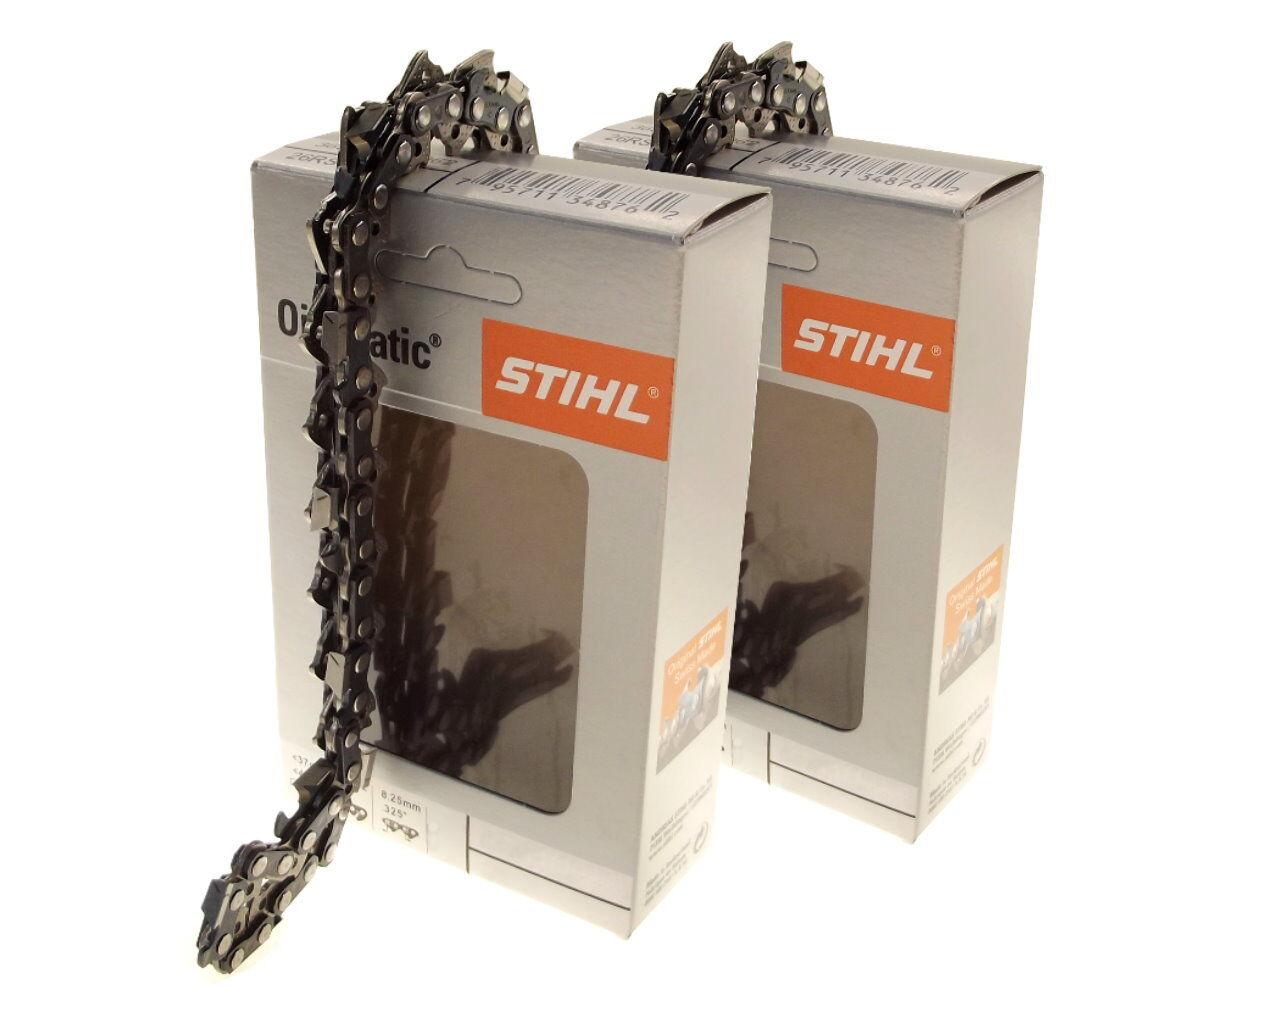 2x40cm Stihl Rapid Super cadena para solista 650 650 650 motosierra sierra cadena .325 1,5 ecd22c